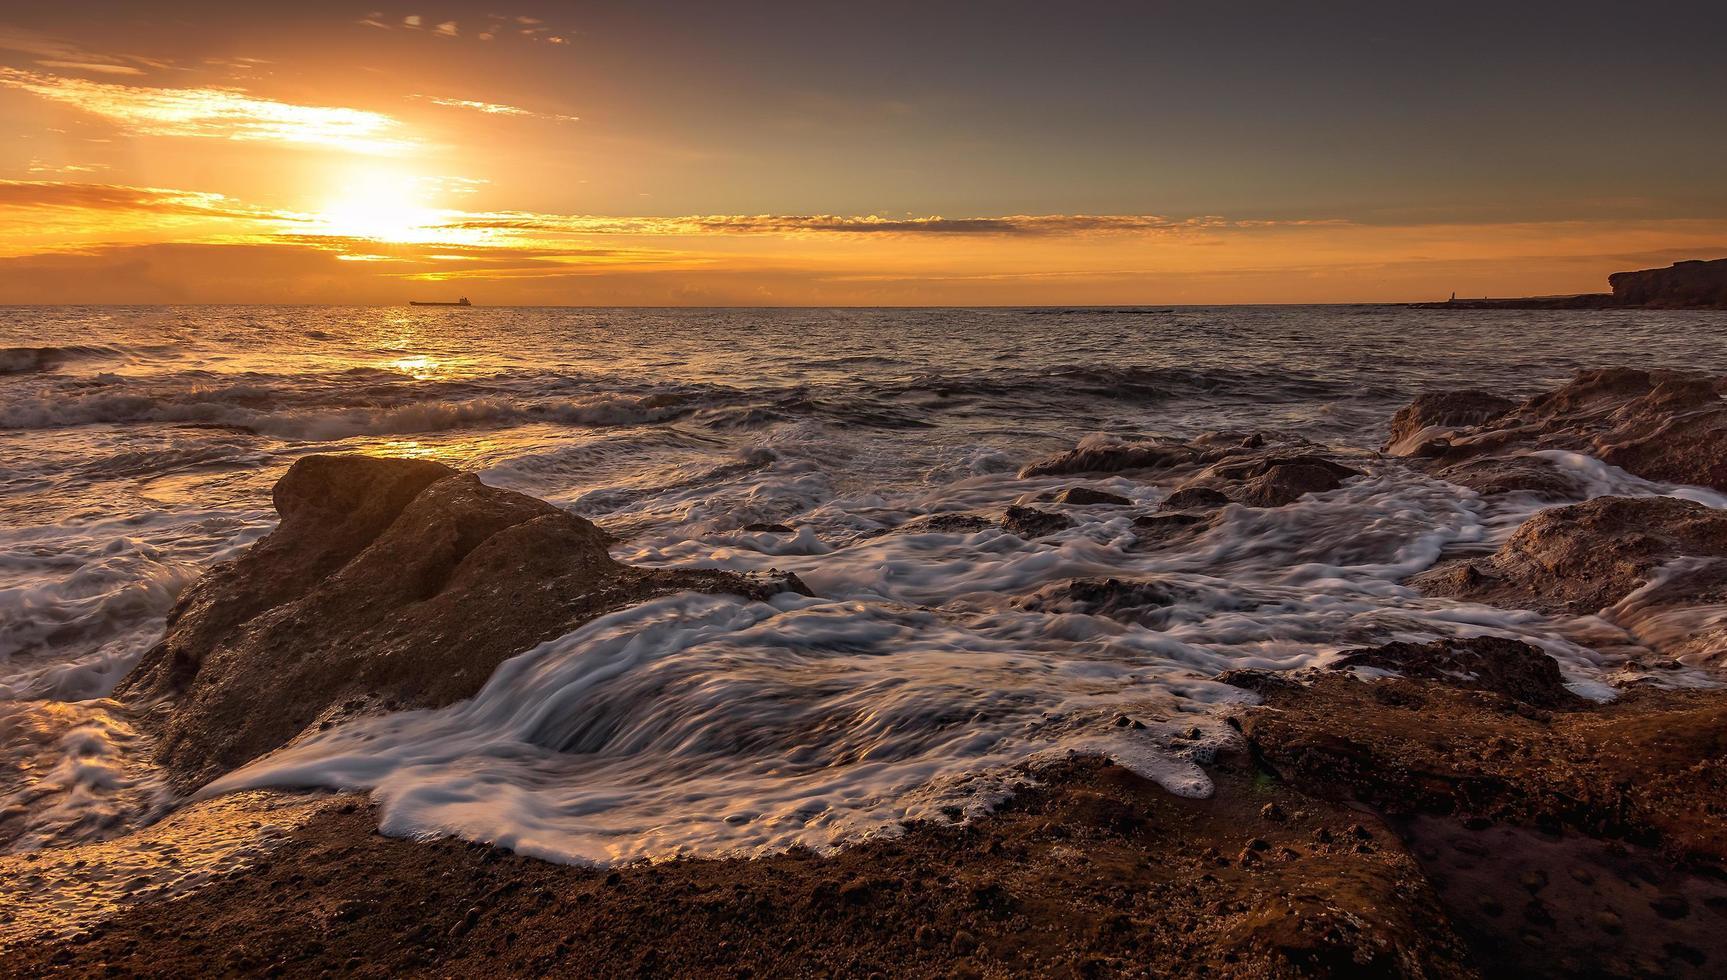 golven op de wal tijdens zonsondergang foto